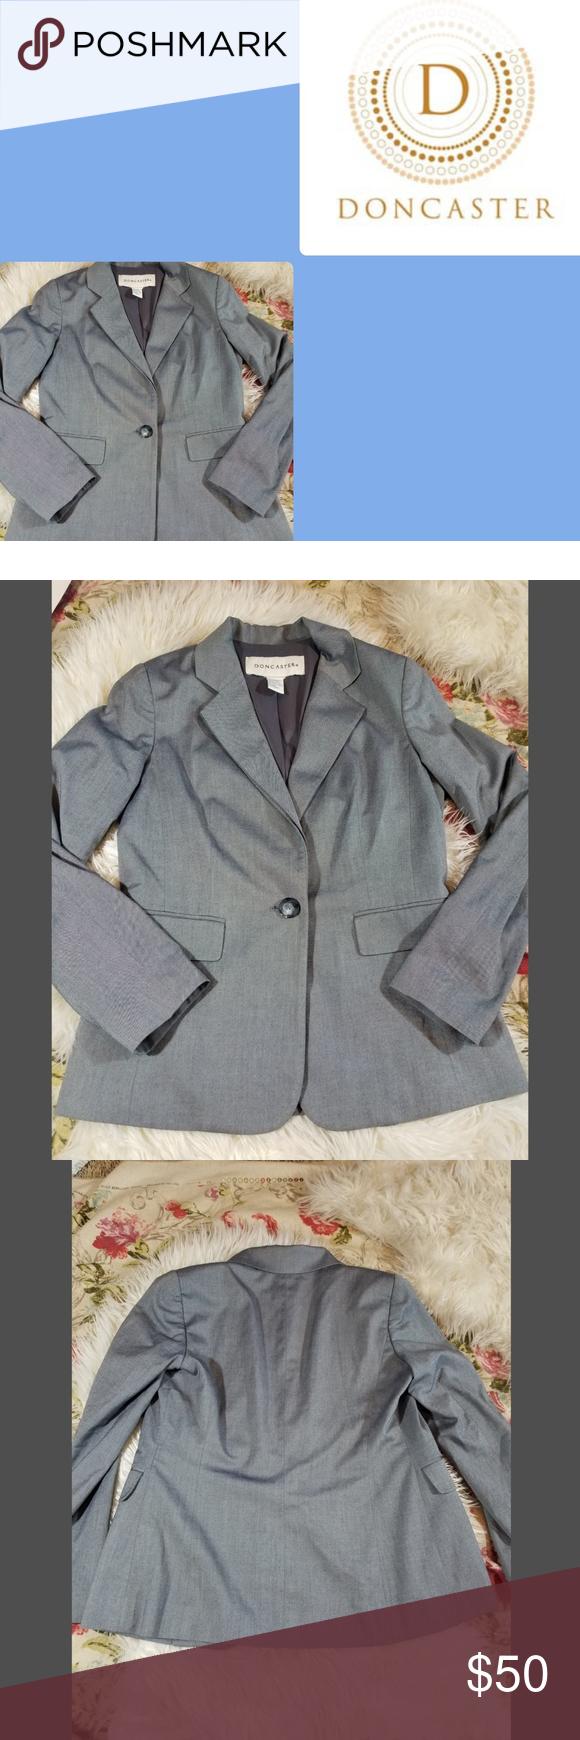 Doncaster Grey Blazer Sz 6 Gorgeous Doncaster Grey Double Collar Blazer Sz 6 Euc Preowned But Excellent Condi Grey Blazer Long Sleeve Tshirt Men Doncaster